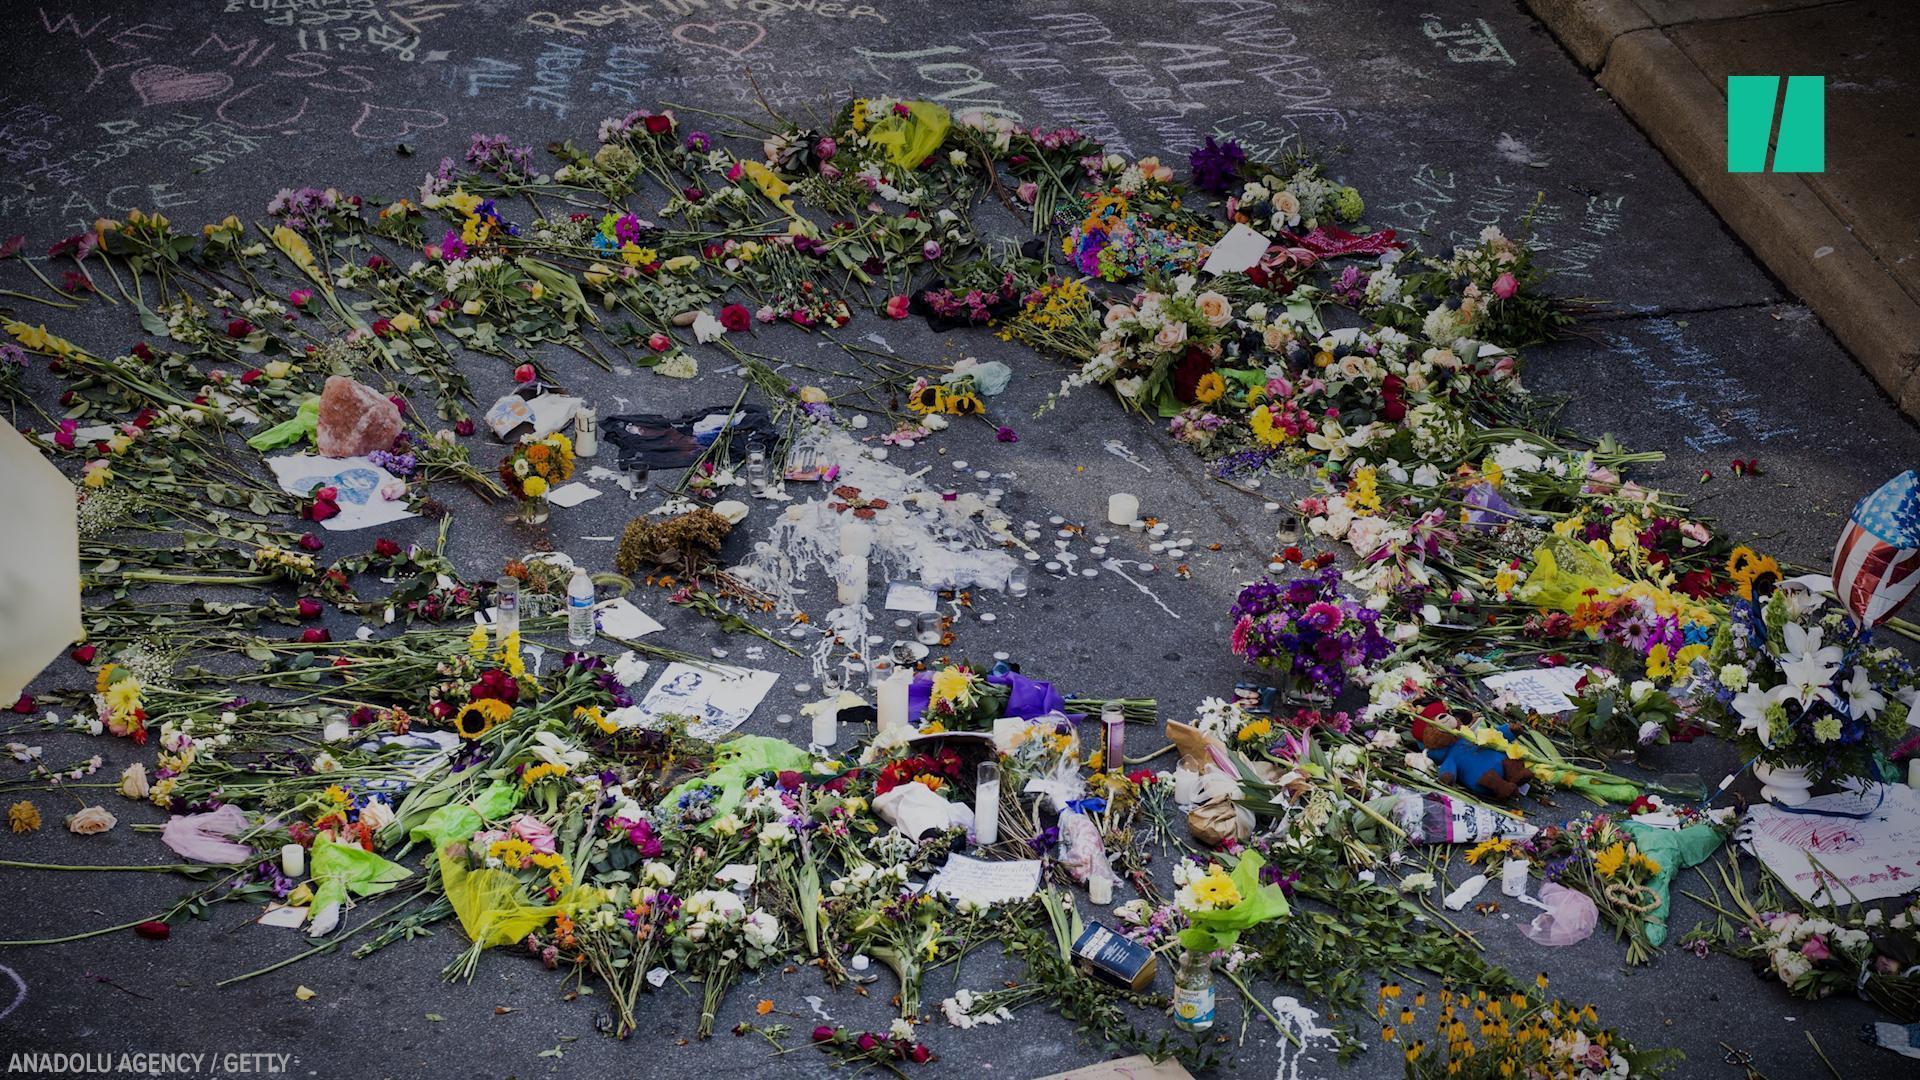 California Gov. Gavin Newsom Says Gender Needs To Be Part Of Gun Violence Conversation